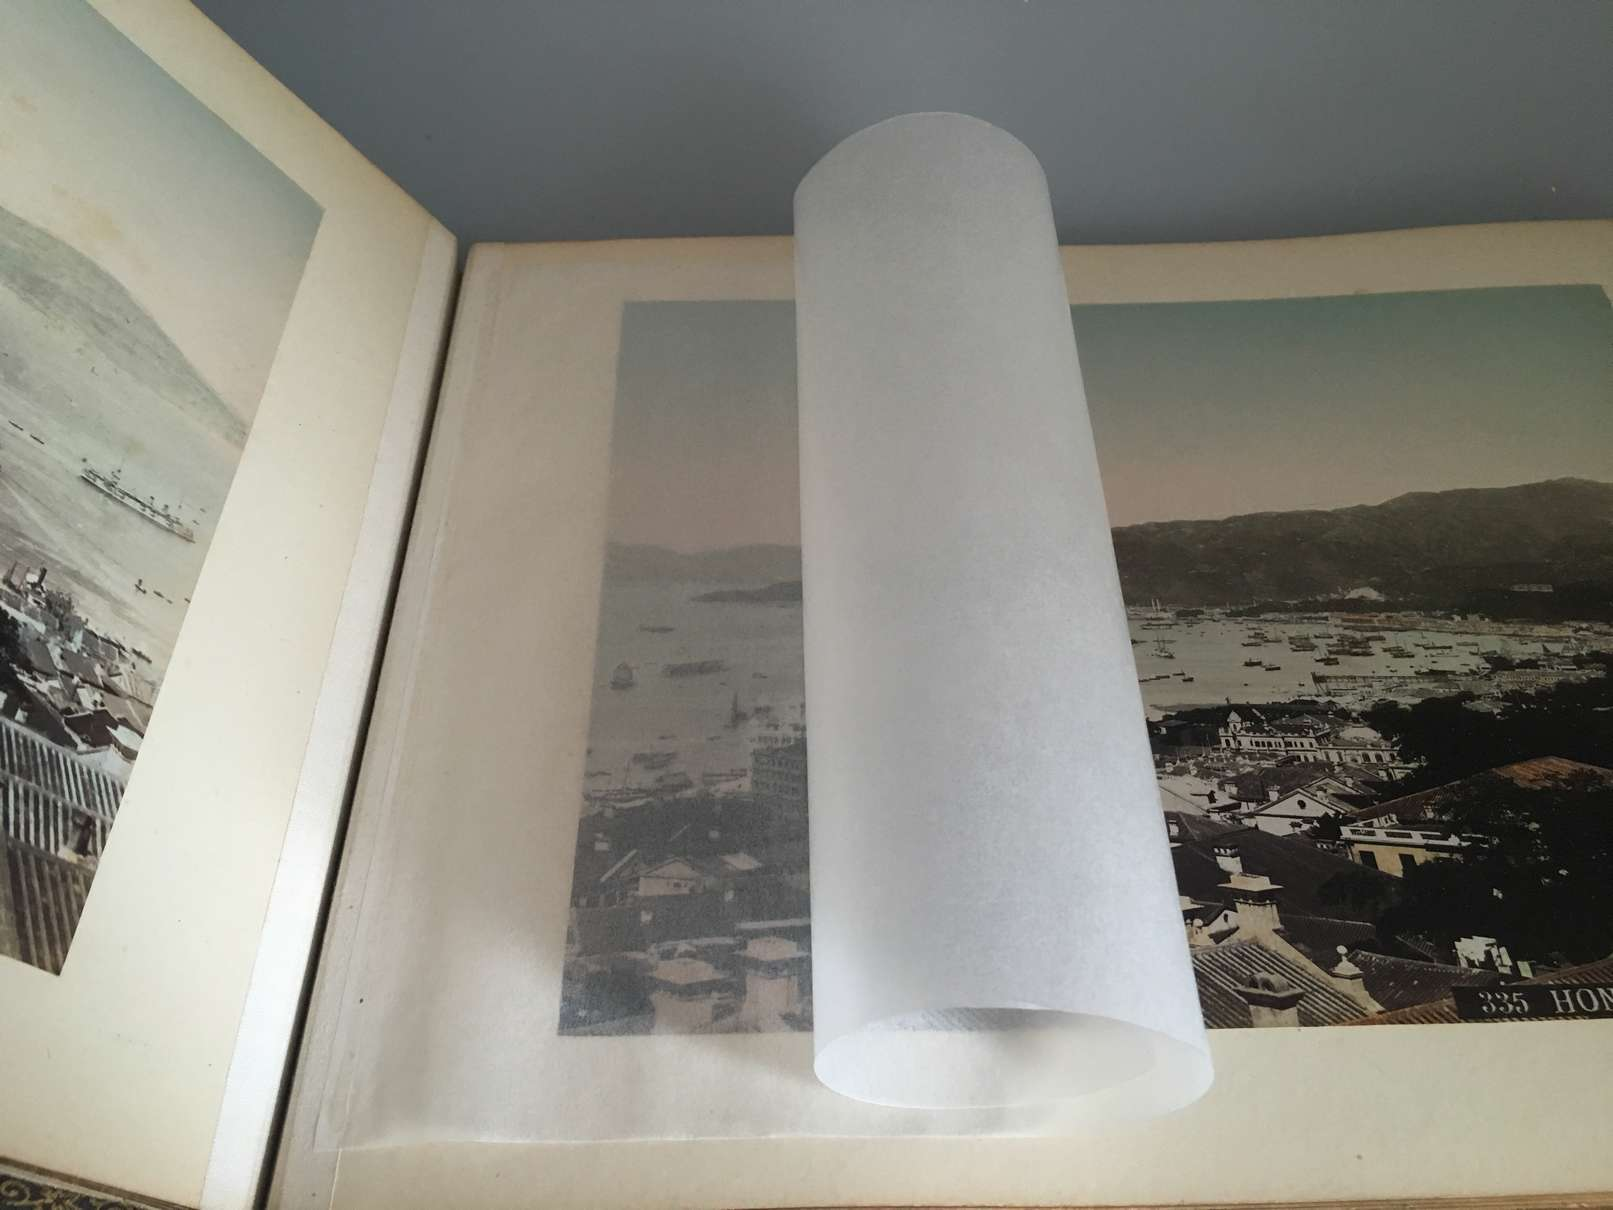 papier-photo-restauration-restaurarte-art.jpg